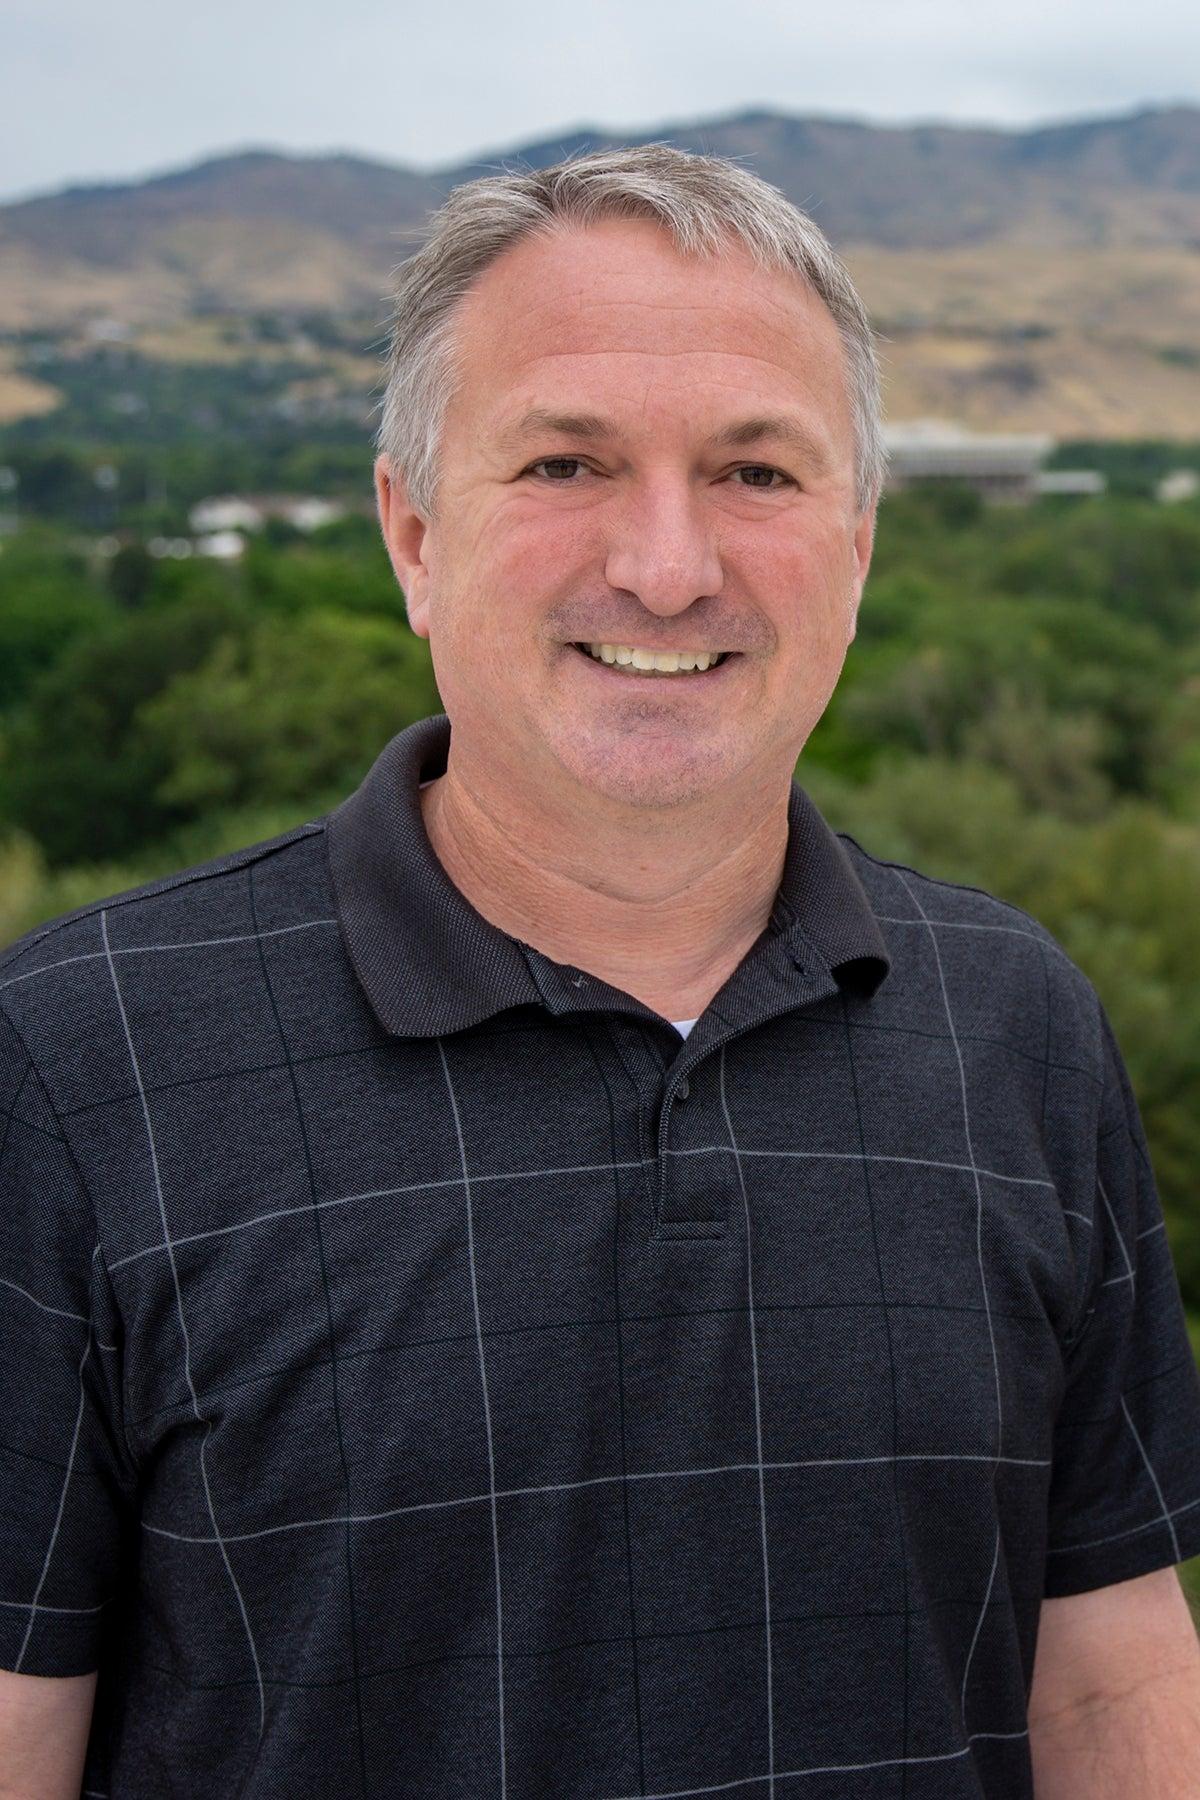 Brad Coats portrait